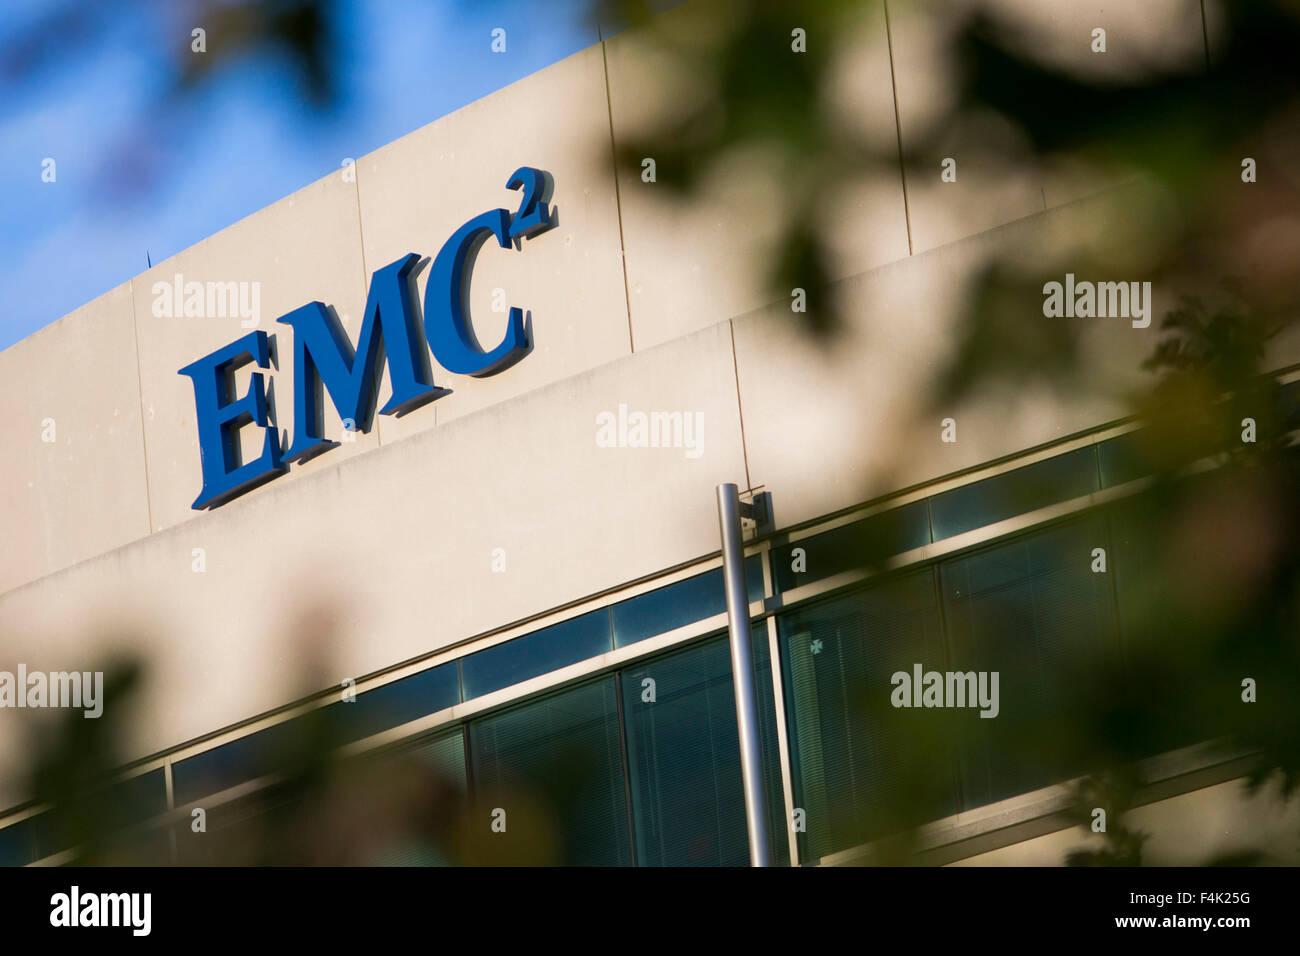 Emc Stock Photos Emc Stock Images Alamy